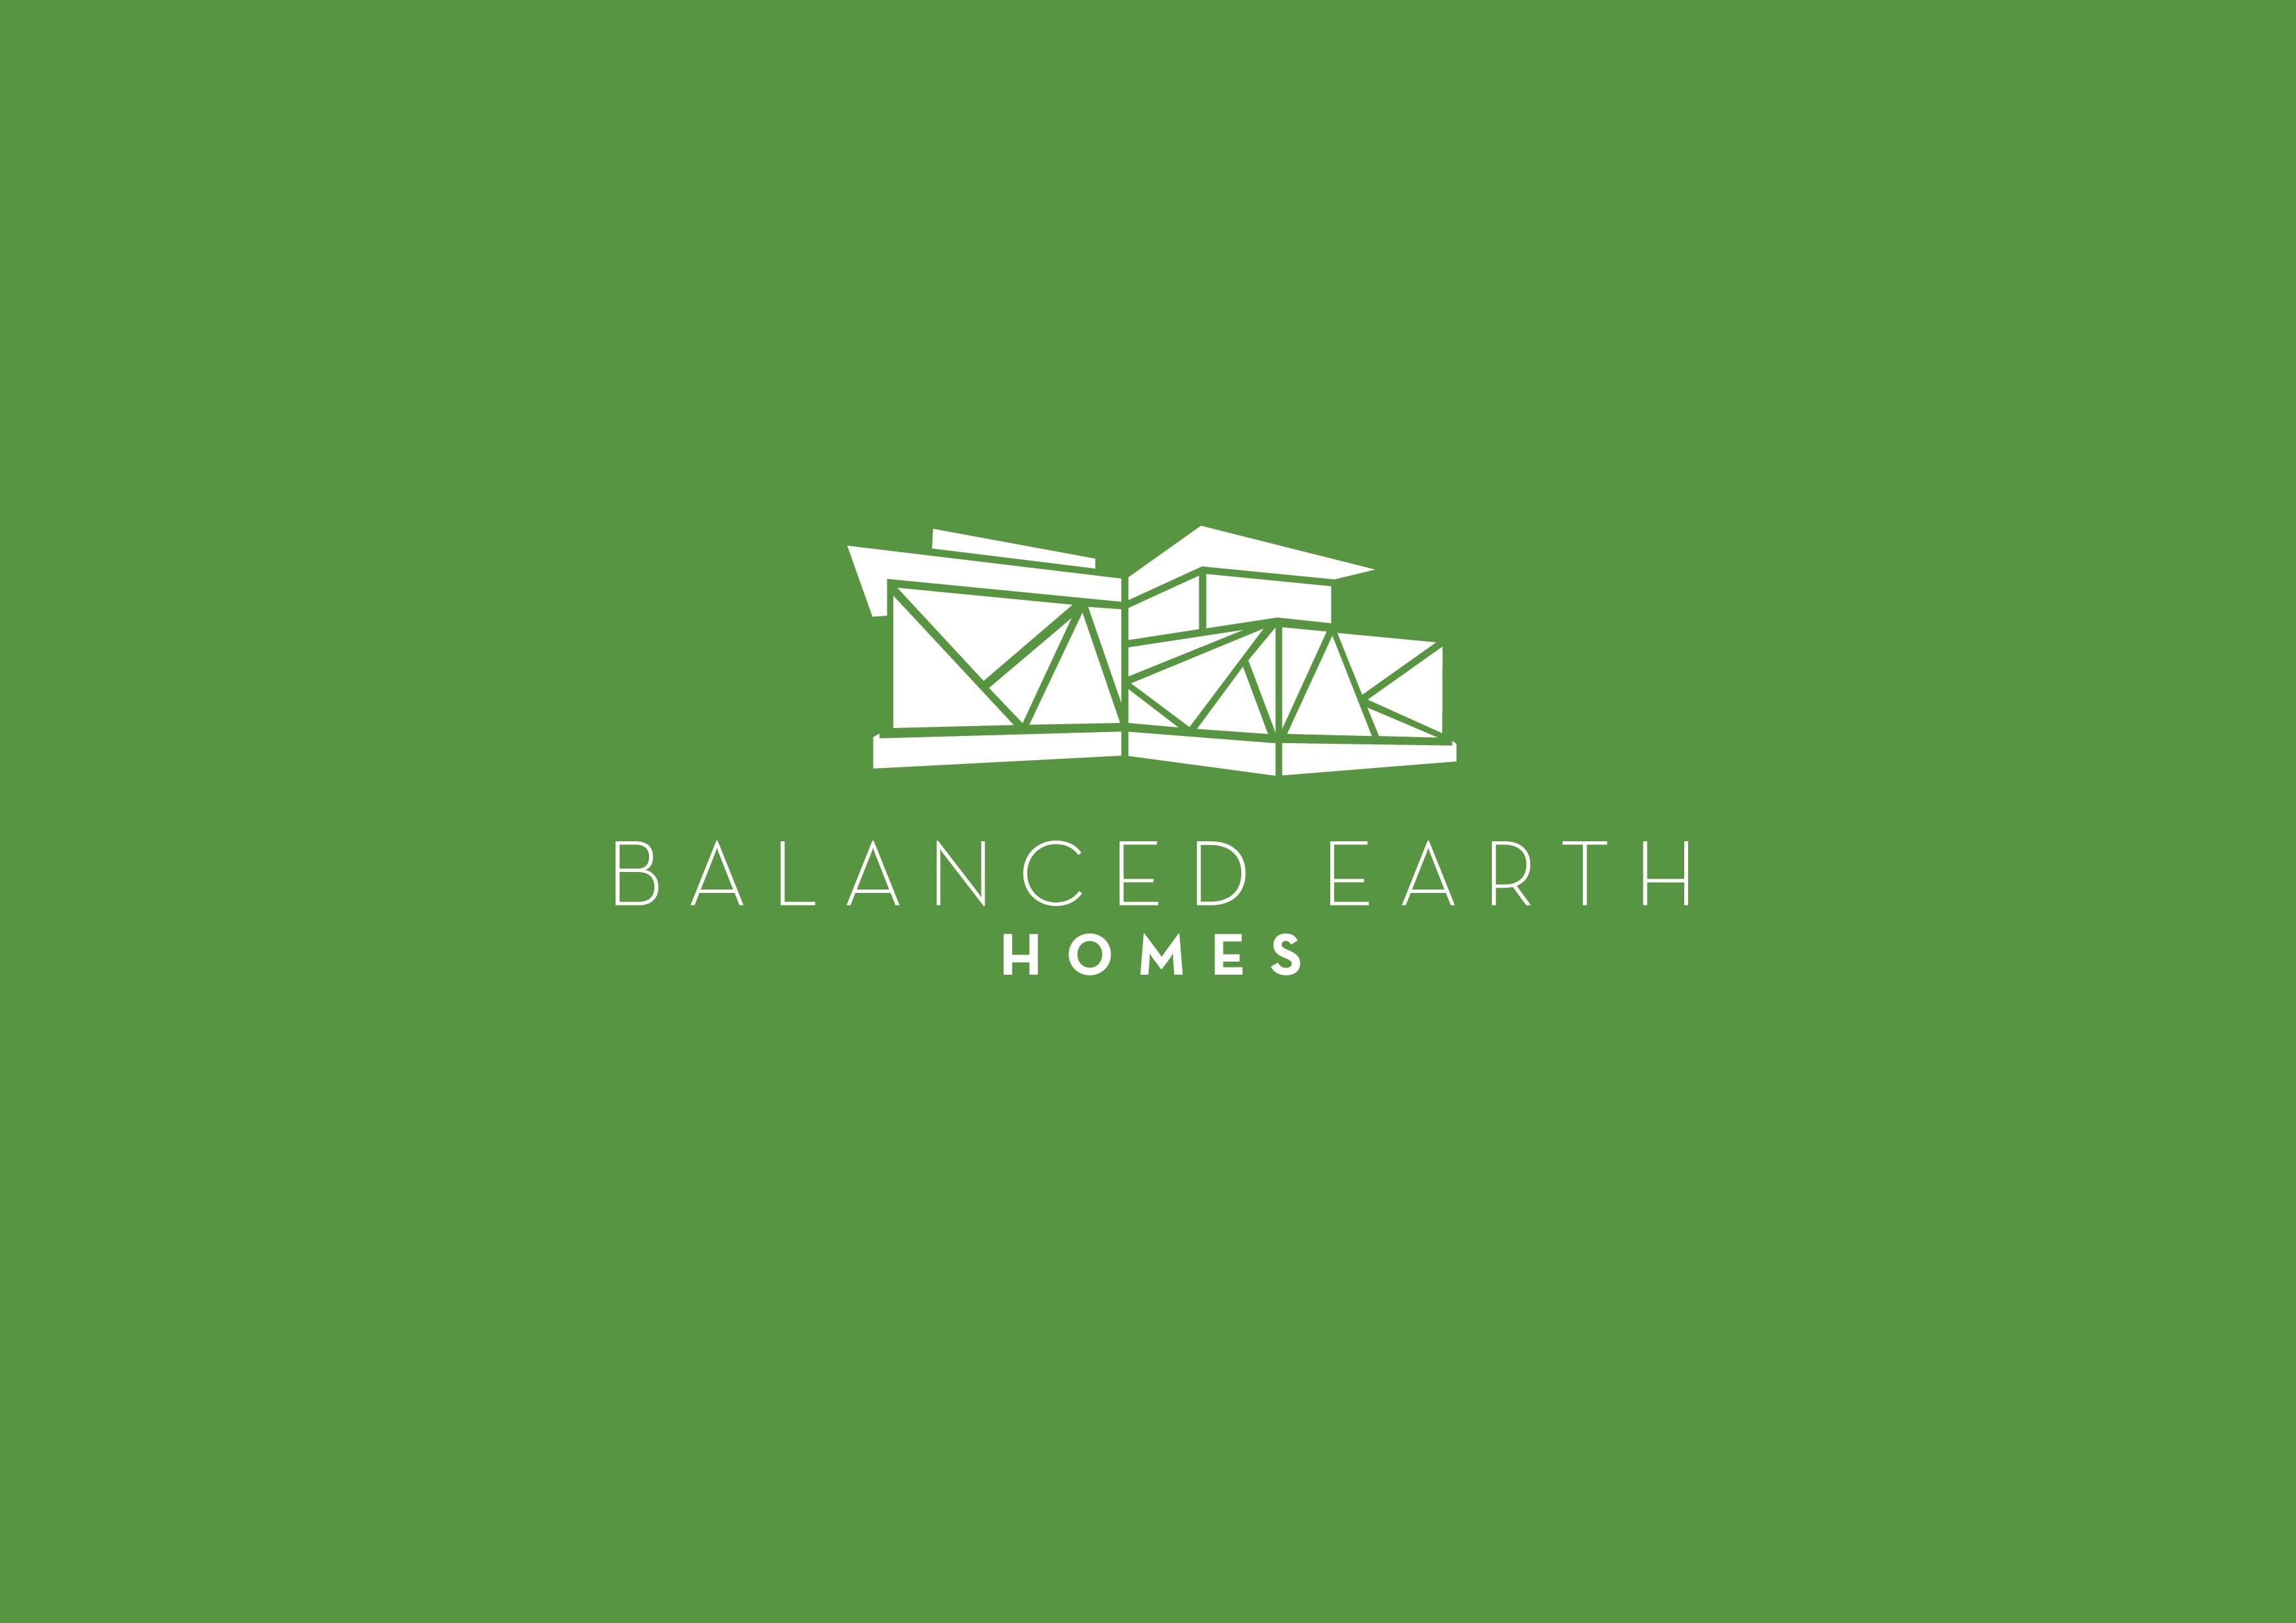 Design an impactful new logo for Balanced Earth Homes